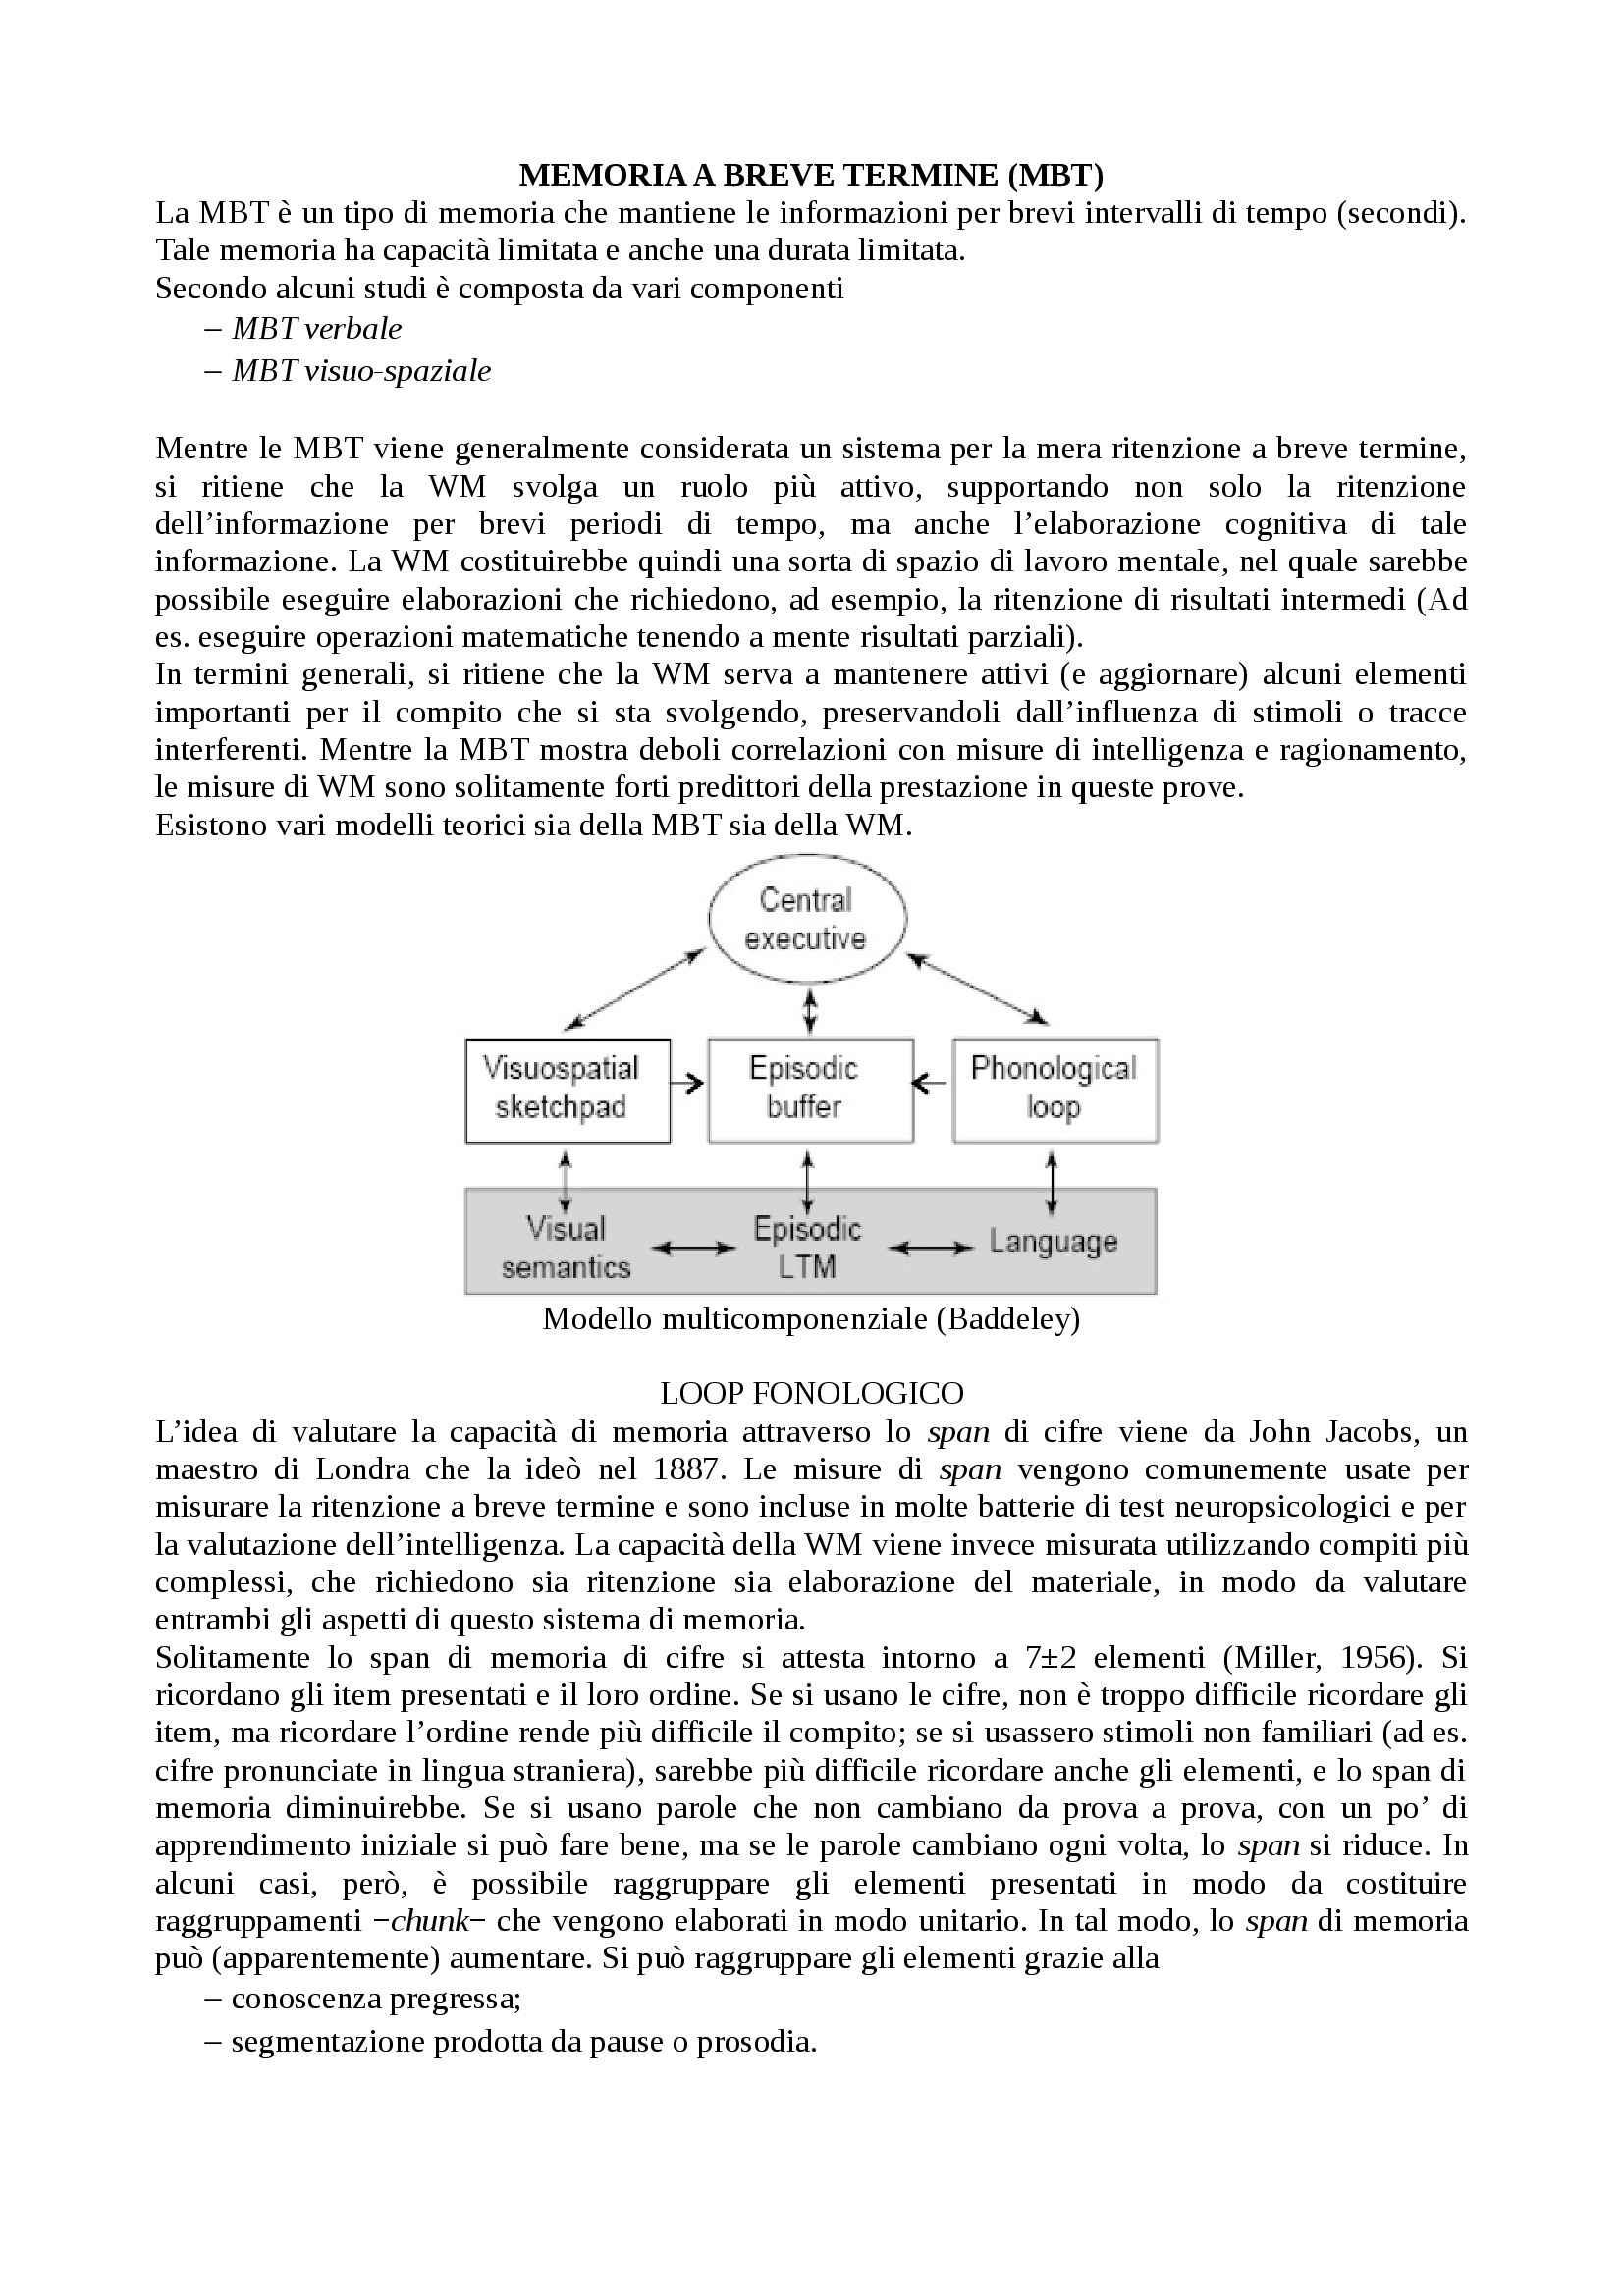 appunto F. Del Missier Processi cognitivi